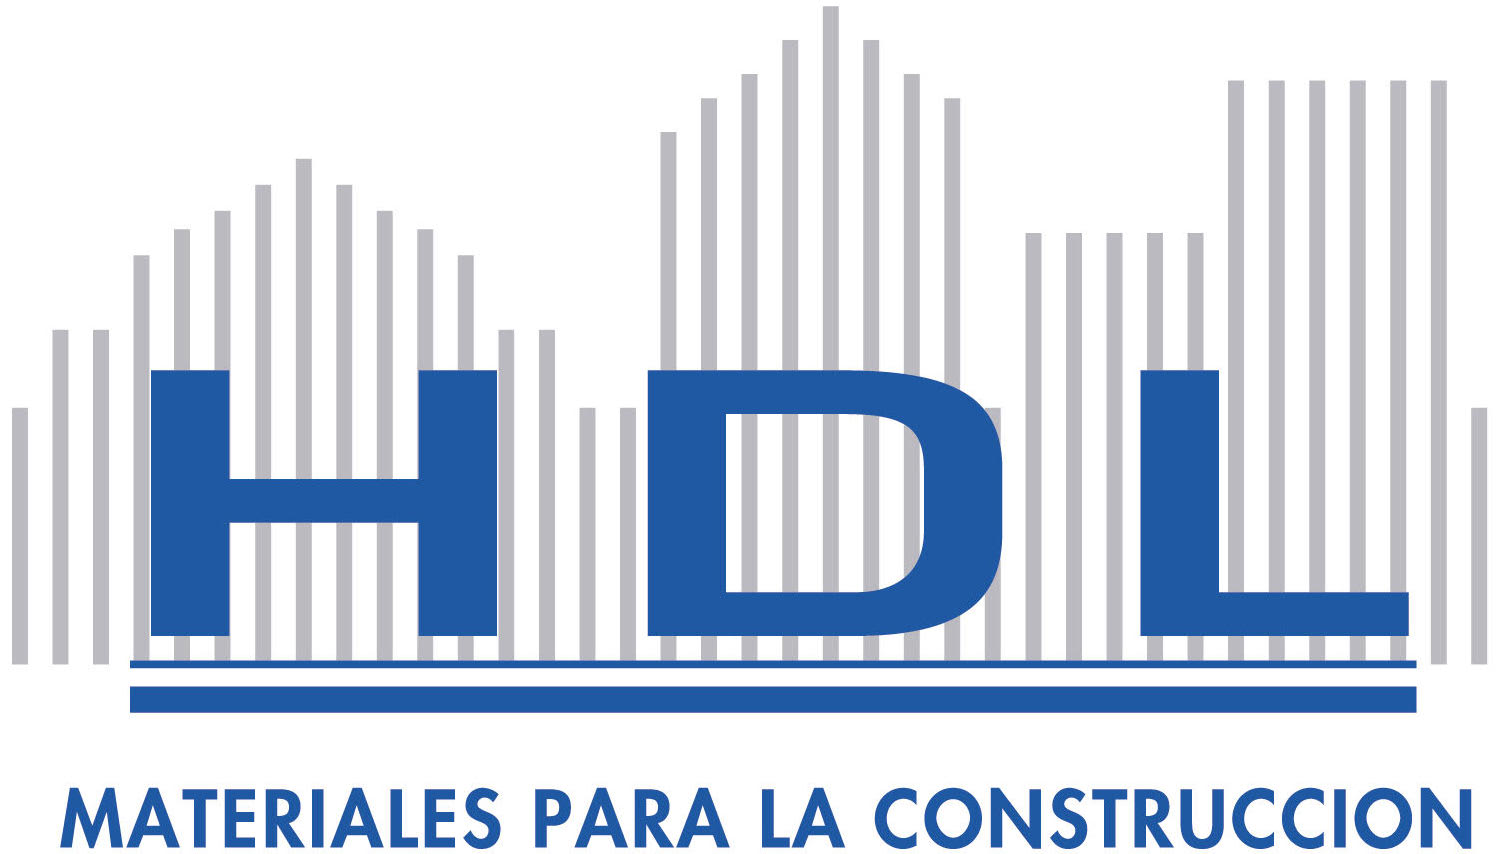 Hdl distribuidora materiales para la construcci n - Materiales termicos para construccion ...